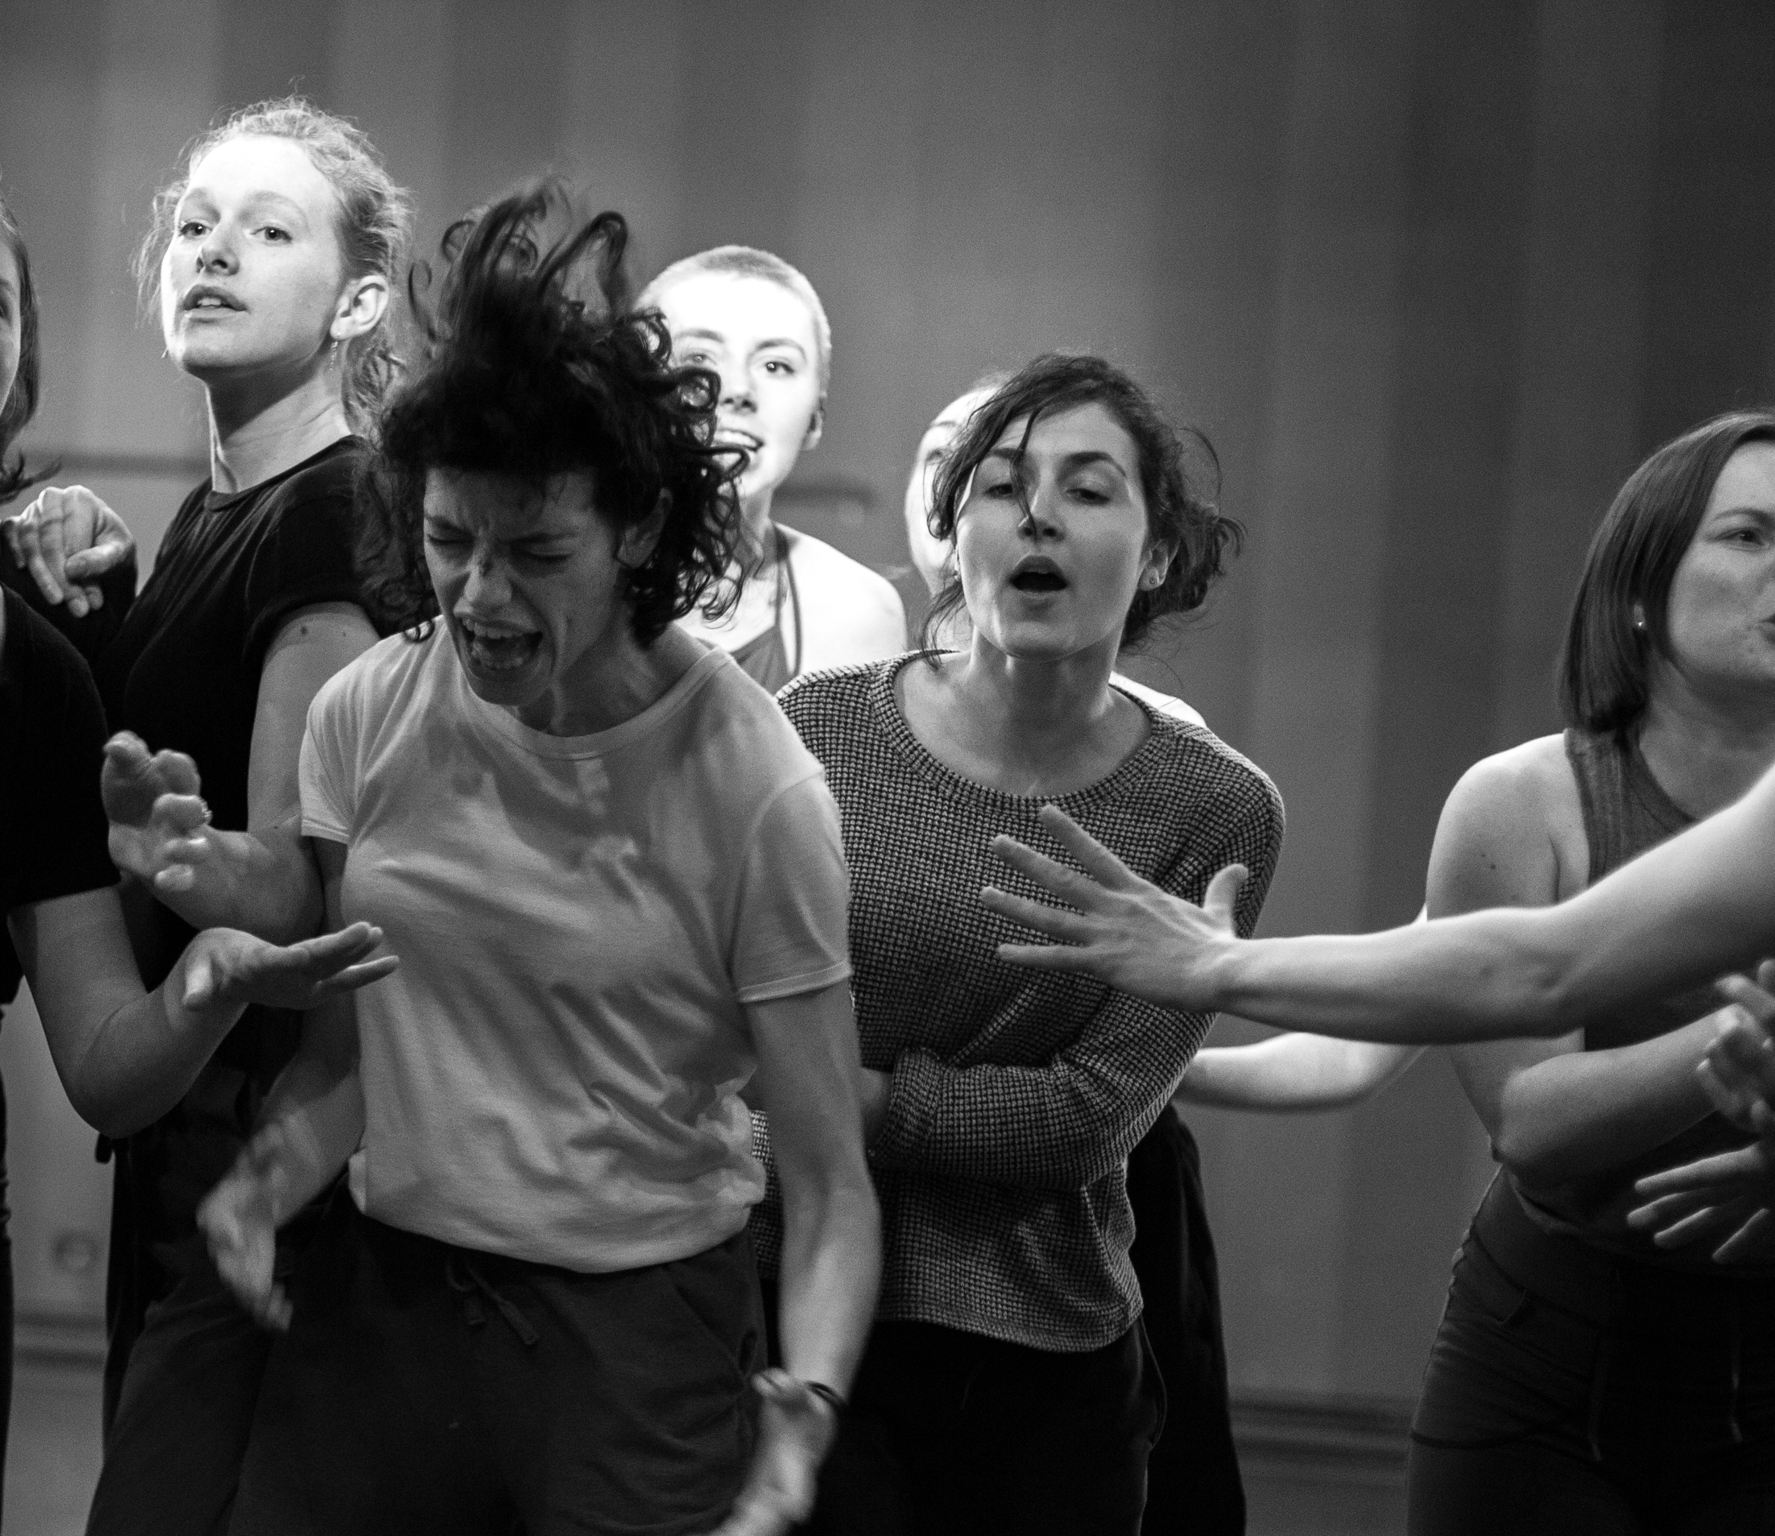 © Anne-Flore de Rochambeau // TransFormation Danse 2017 | Oriah Wiersma, Maxine Segalowitz, Clarke Blair, Adeline Faucher, Elsa Tellier